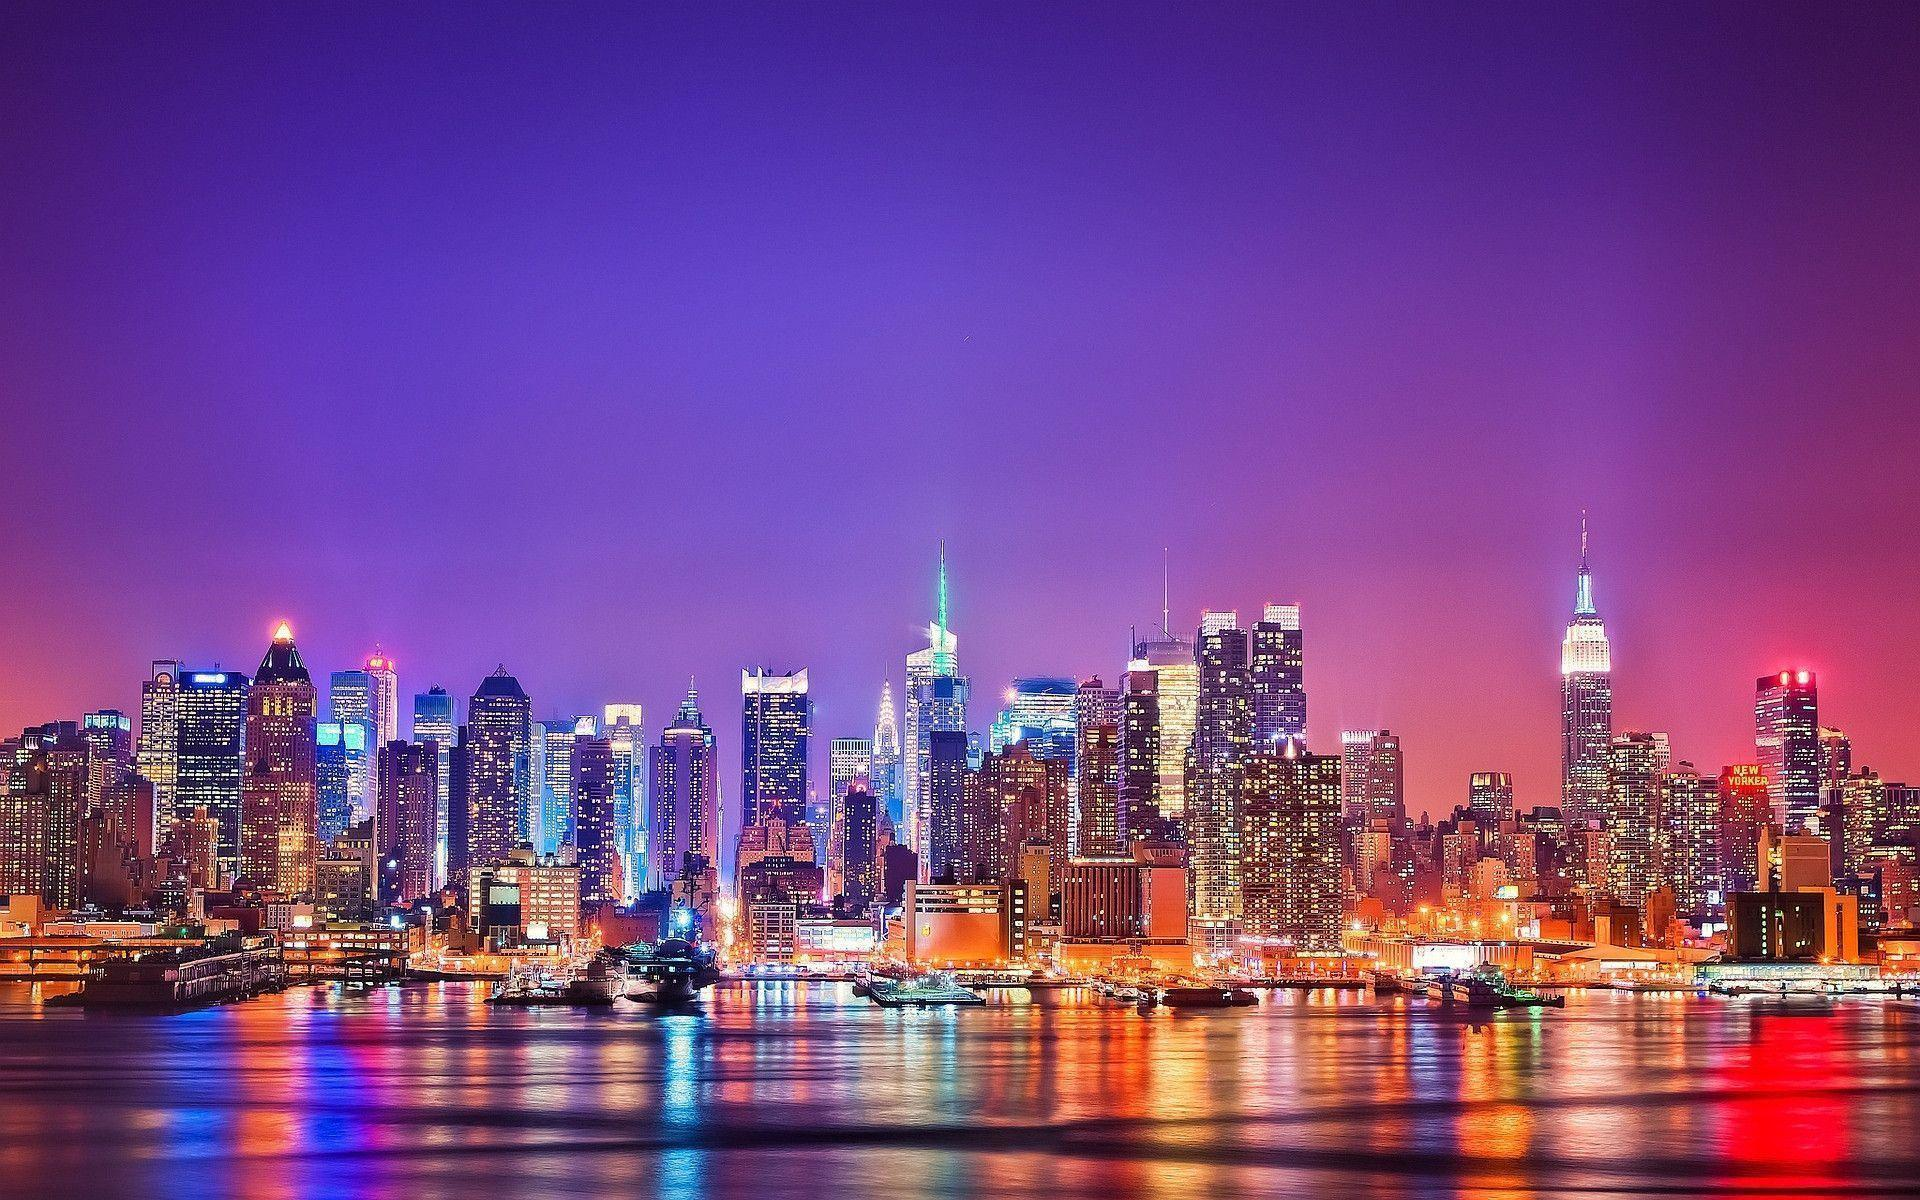 New York City Wallpapers Widescreen - Wallpaper Cave